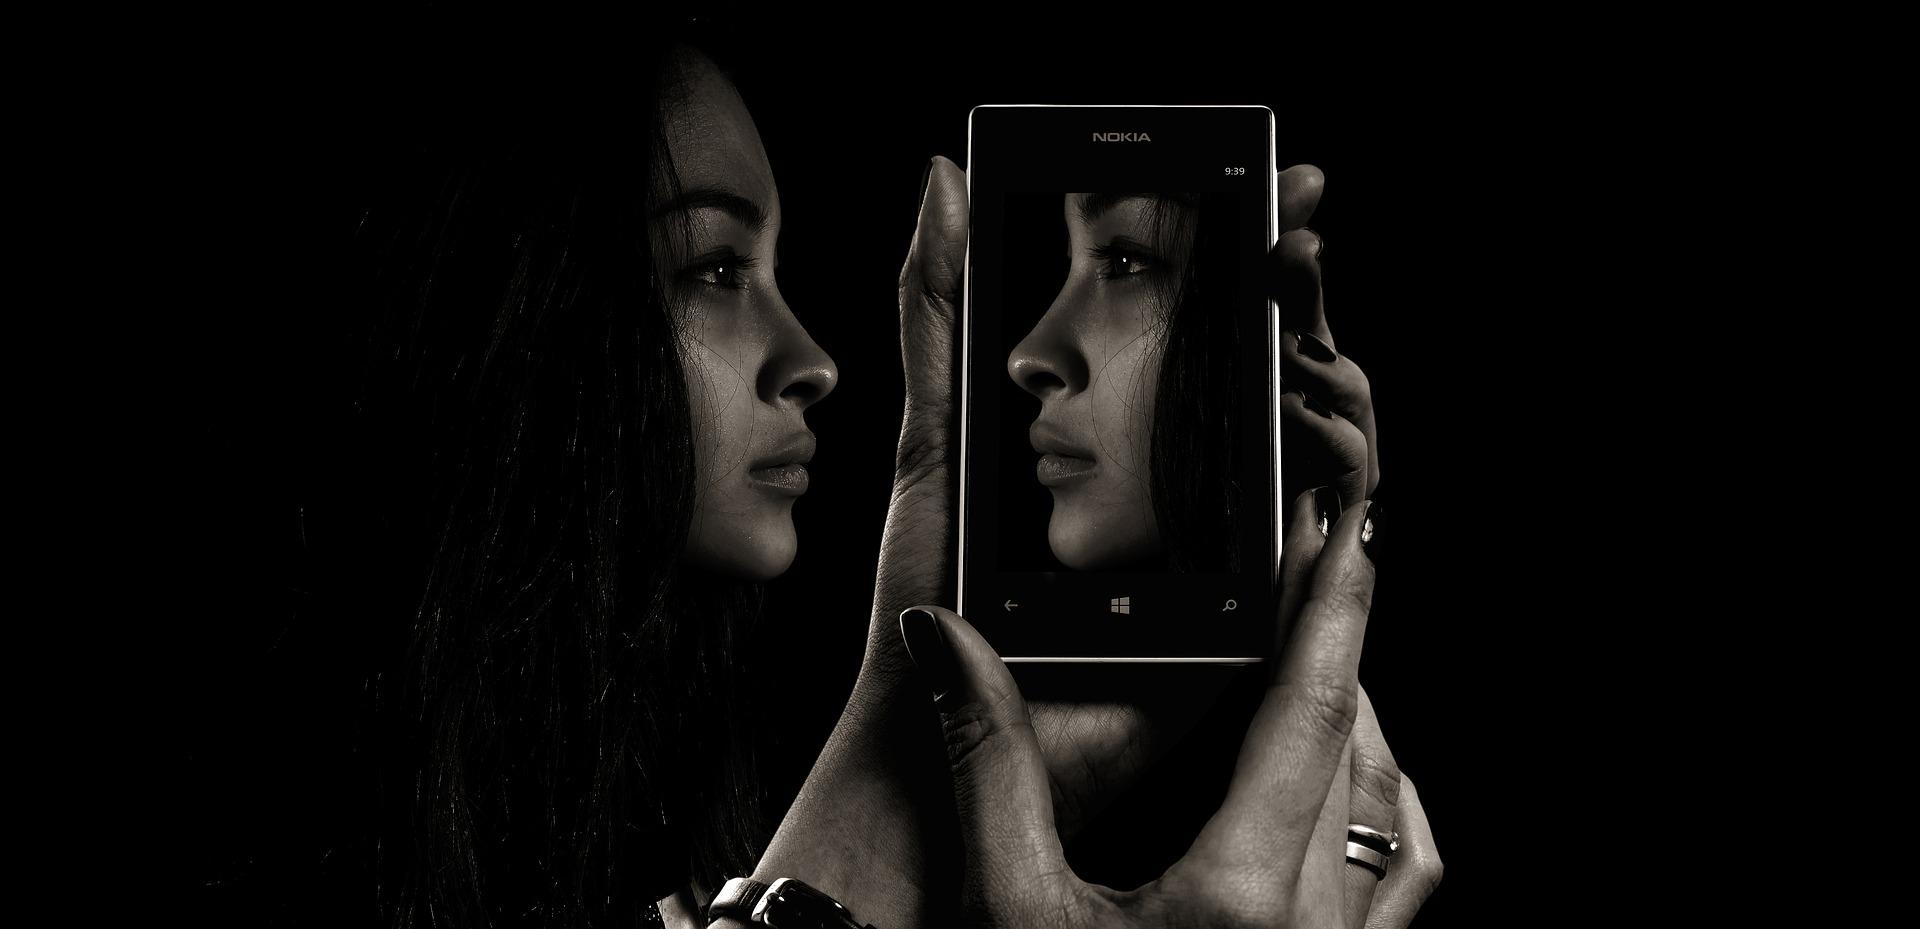 smartphone-1618909_1920.jpg